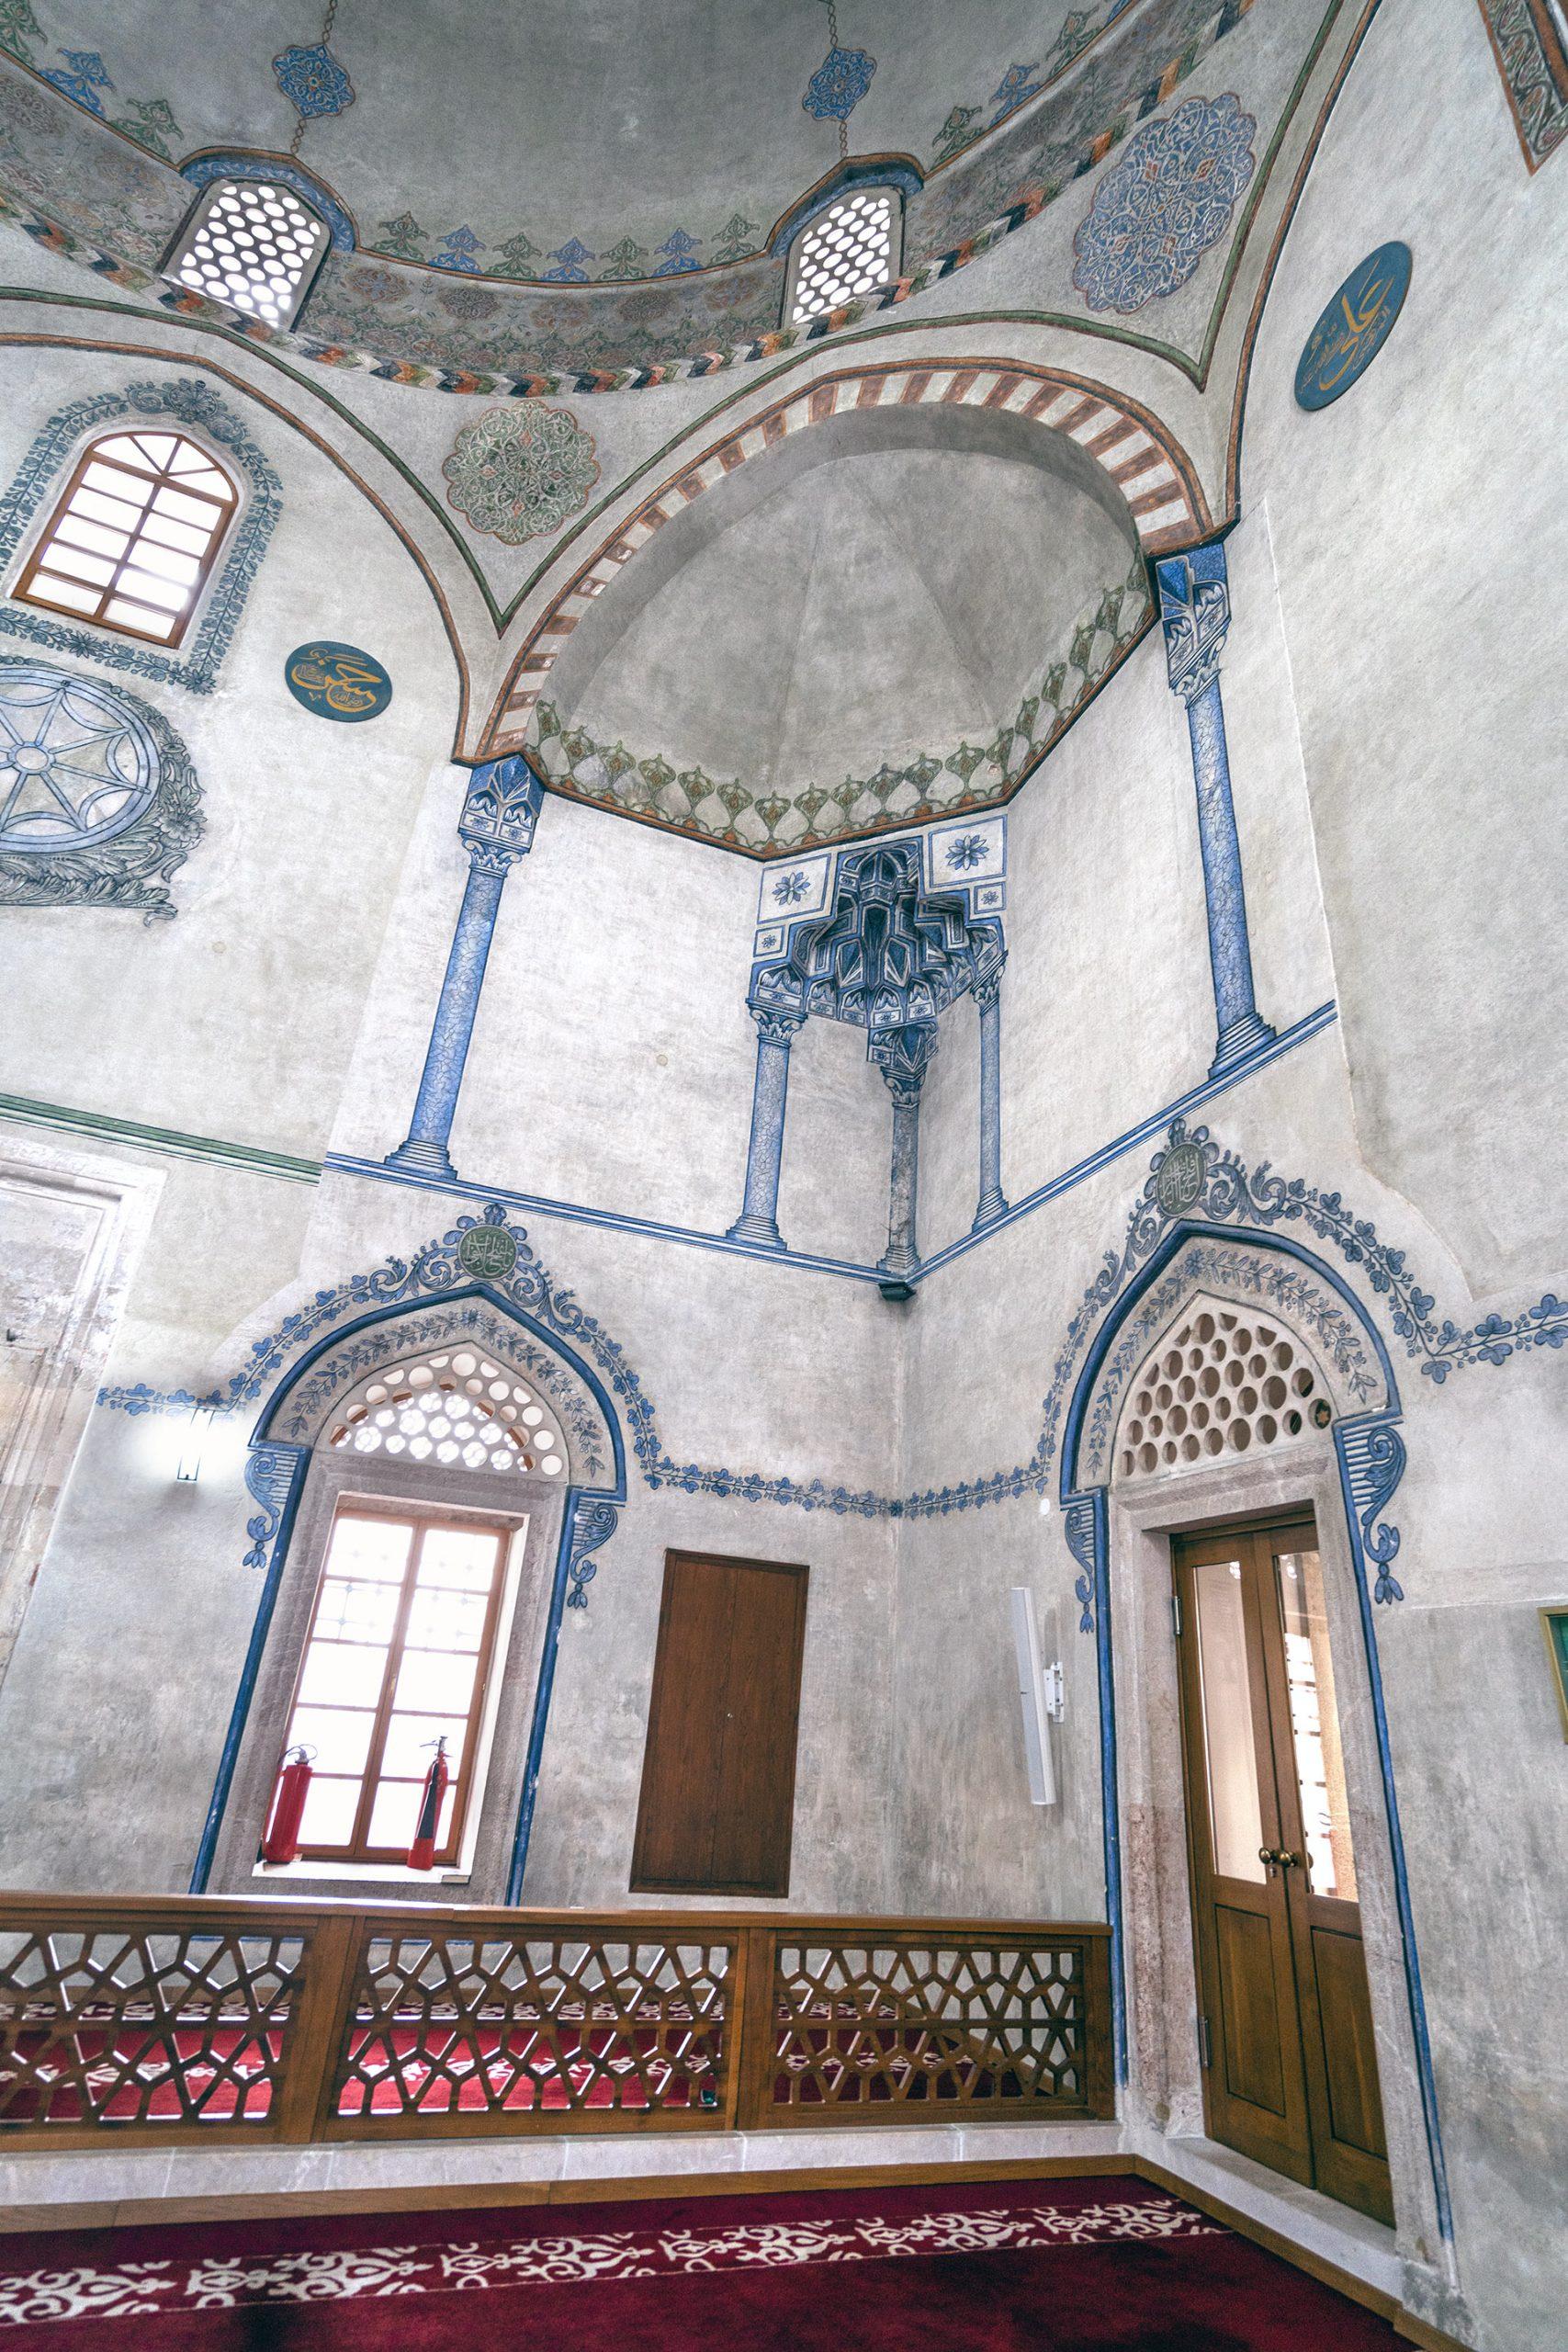 Interior of Emperor's Mosque Sarajevo